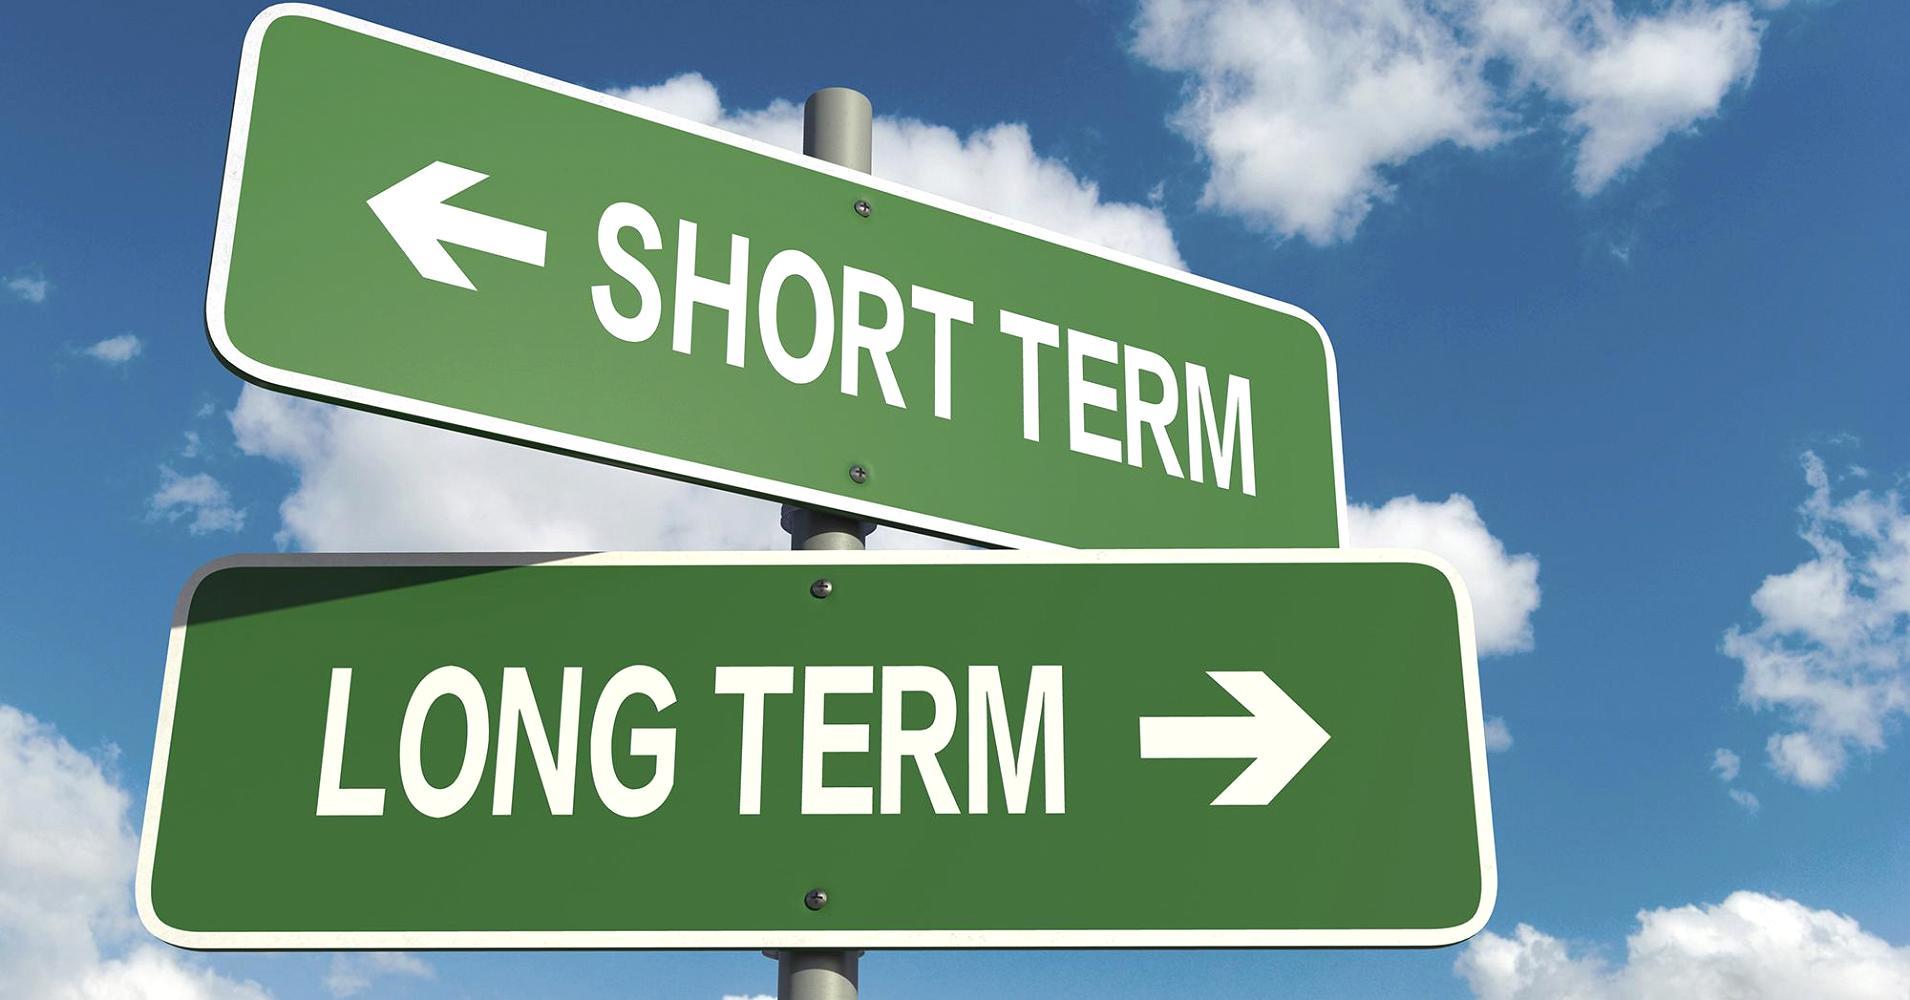 05-short-term-long-term